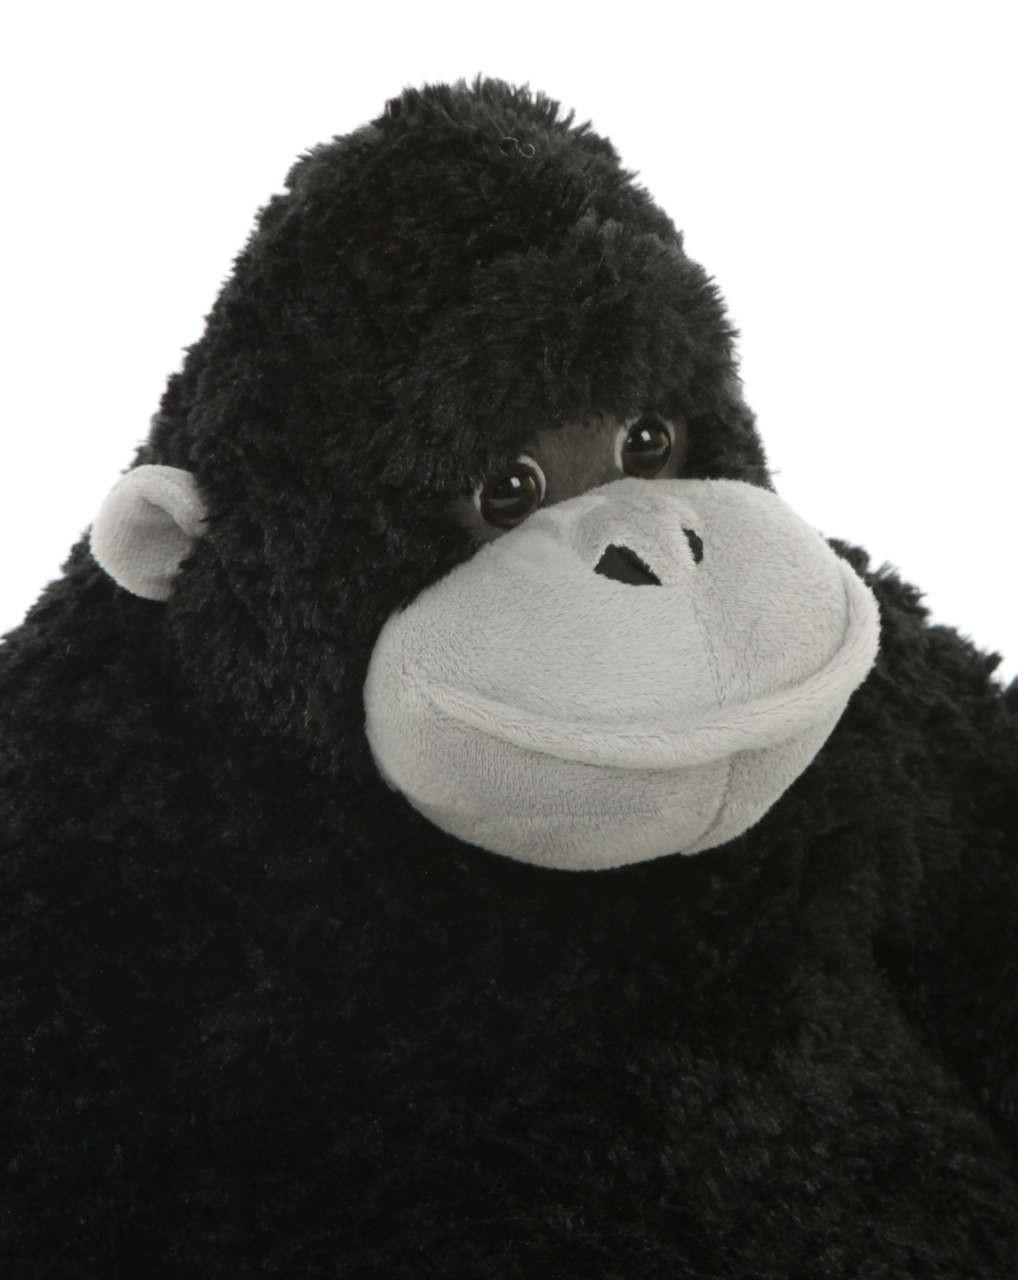 Small Stuffed Gorilla Brother Little Pepe Cutie 19 inch